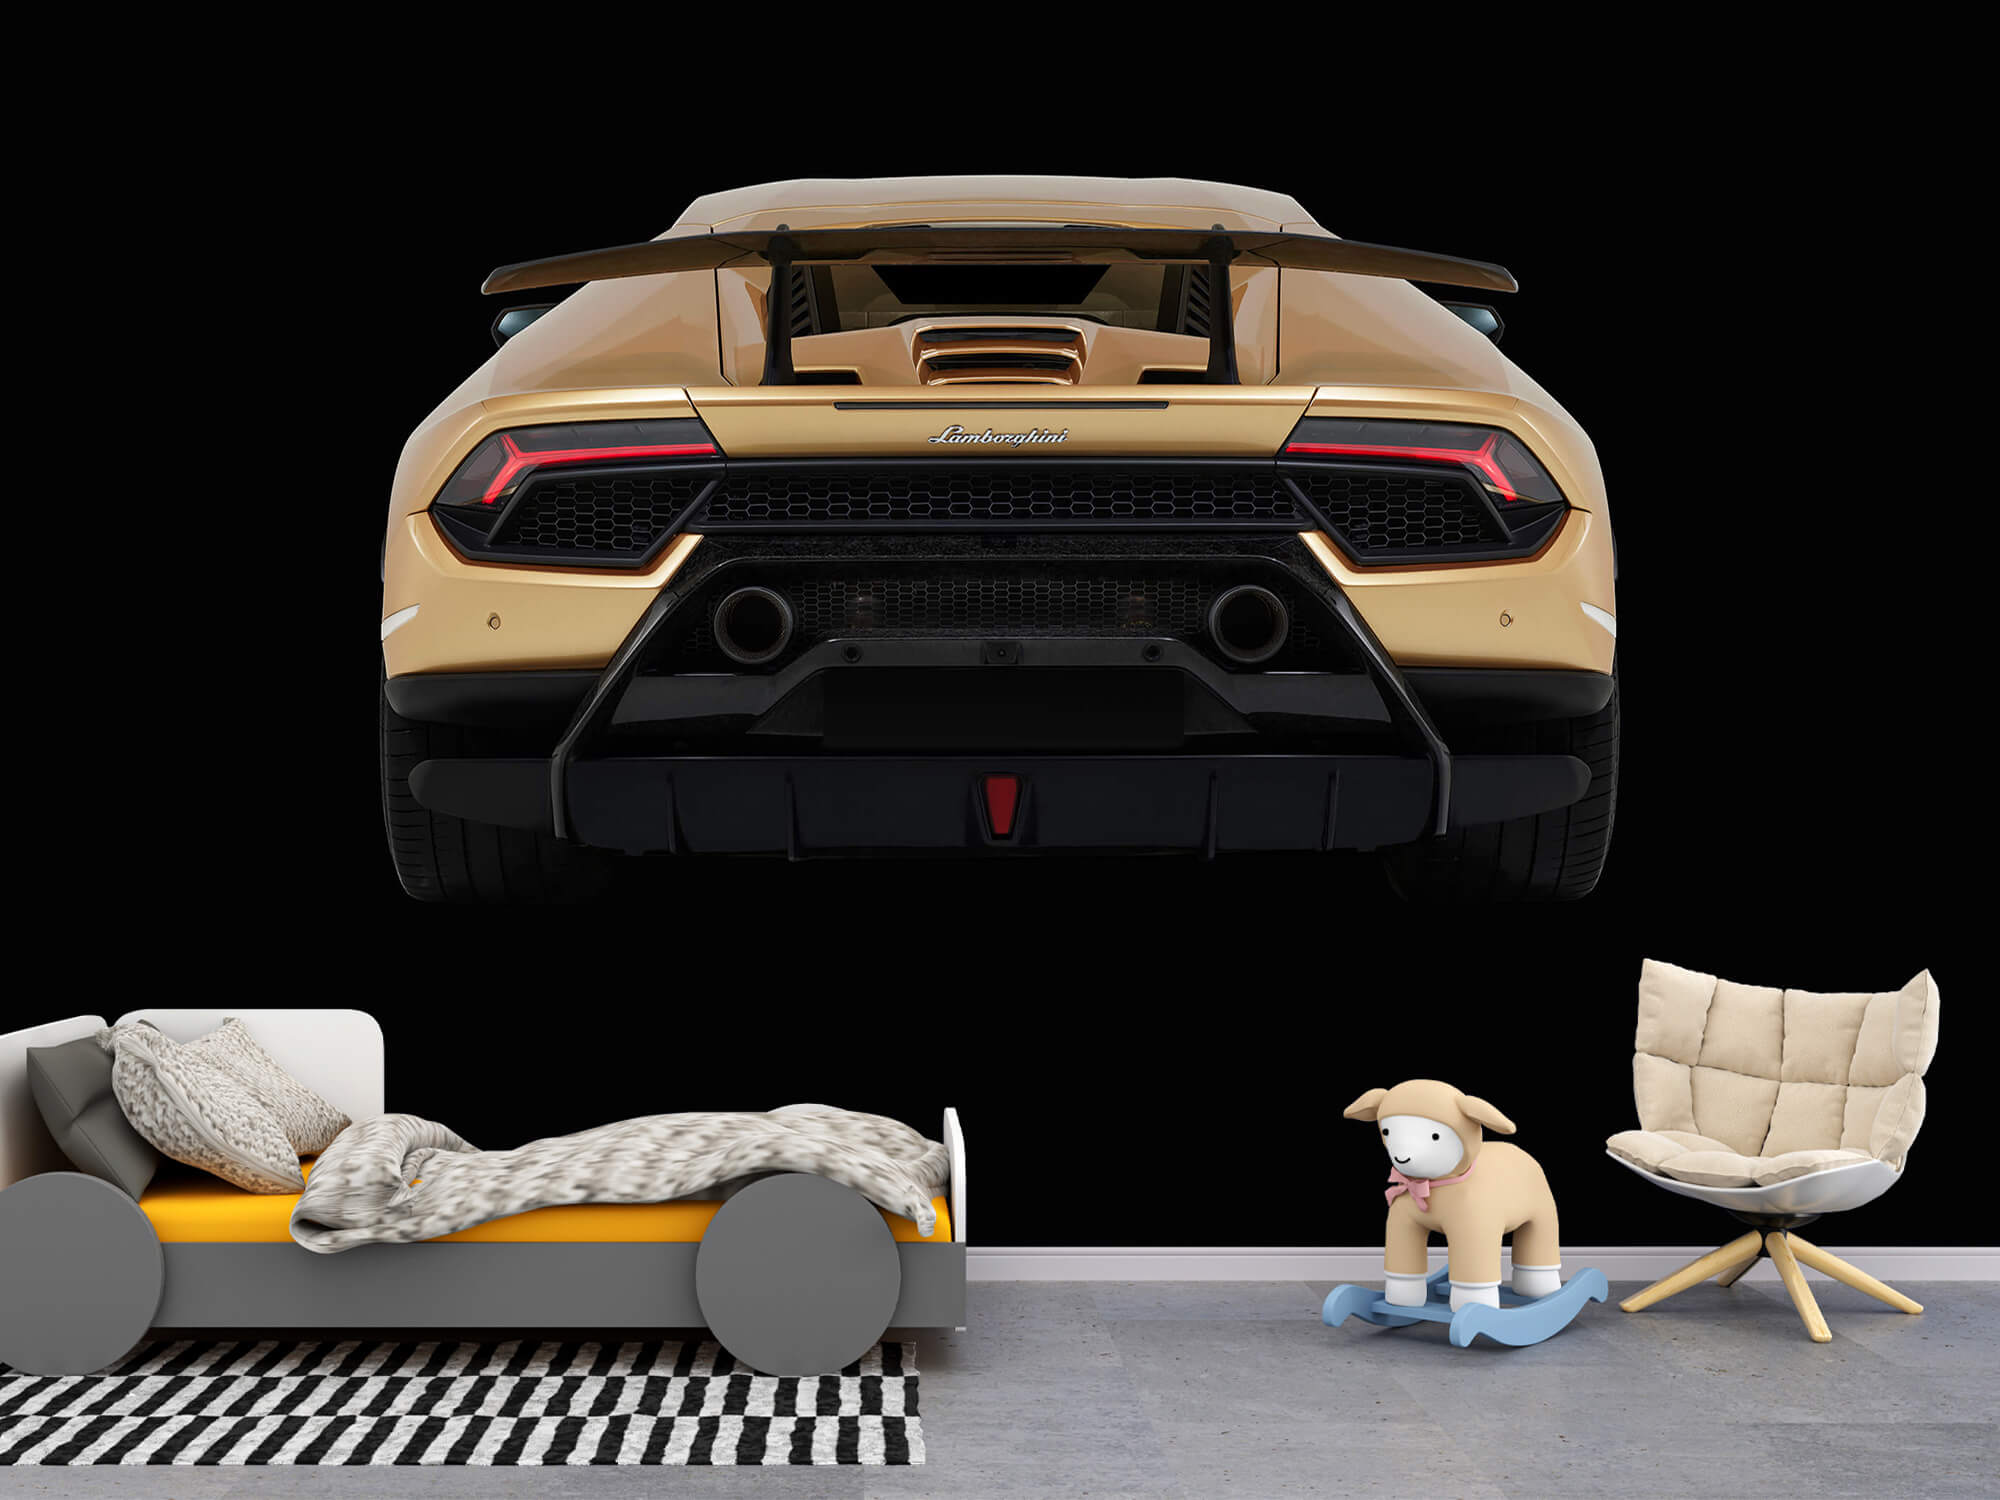 Wallpaper Lamborghini Huracán - Rear view, black 4